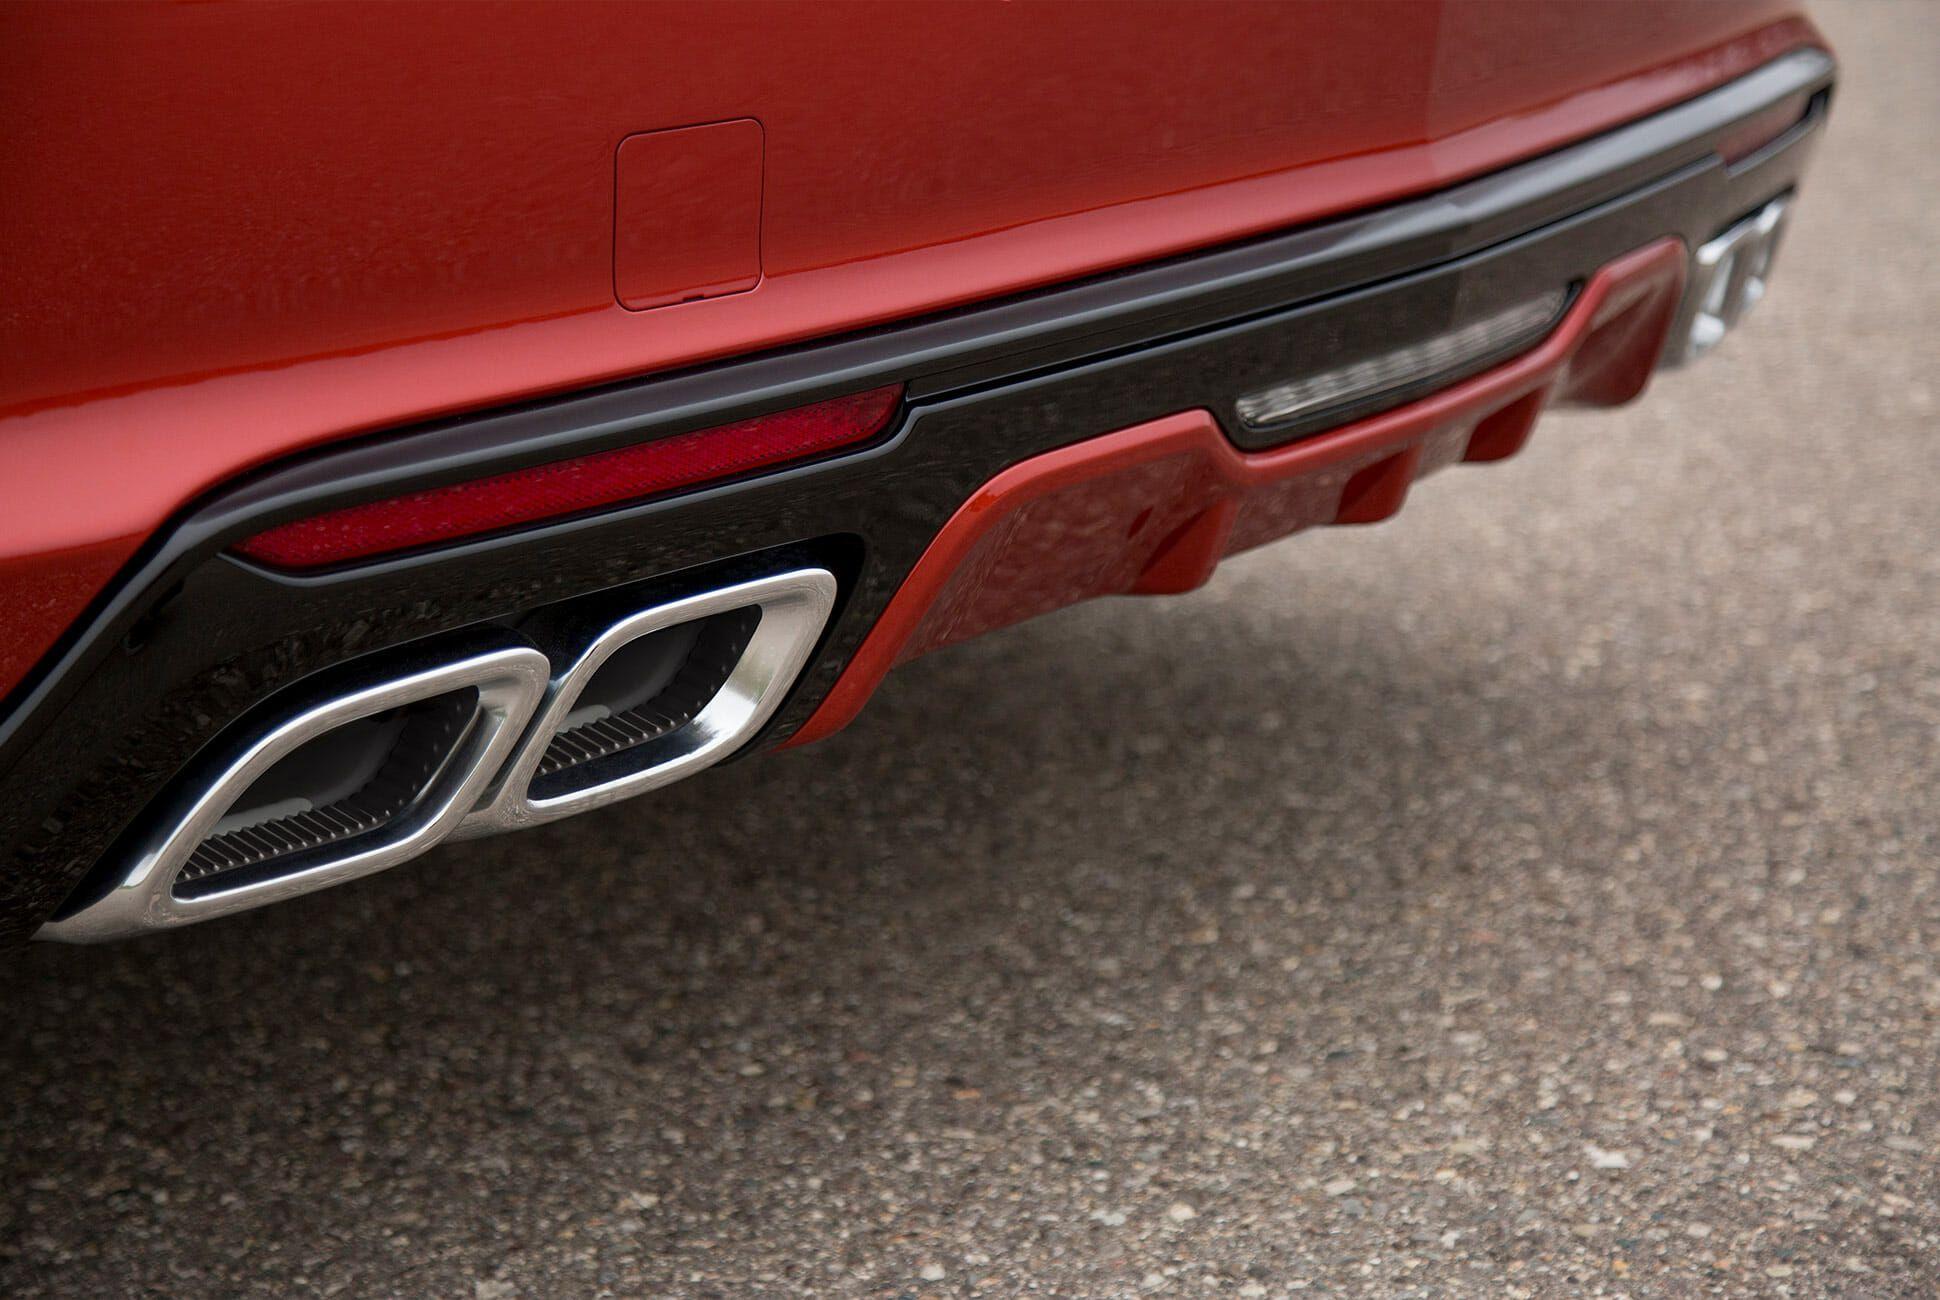 Cadillac-CT4-V-and-CT5-V-Gear-Patrol-slide-3